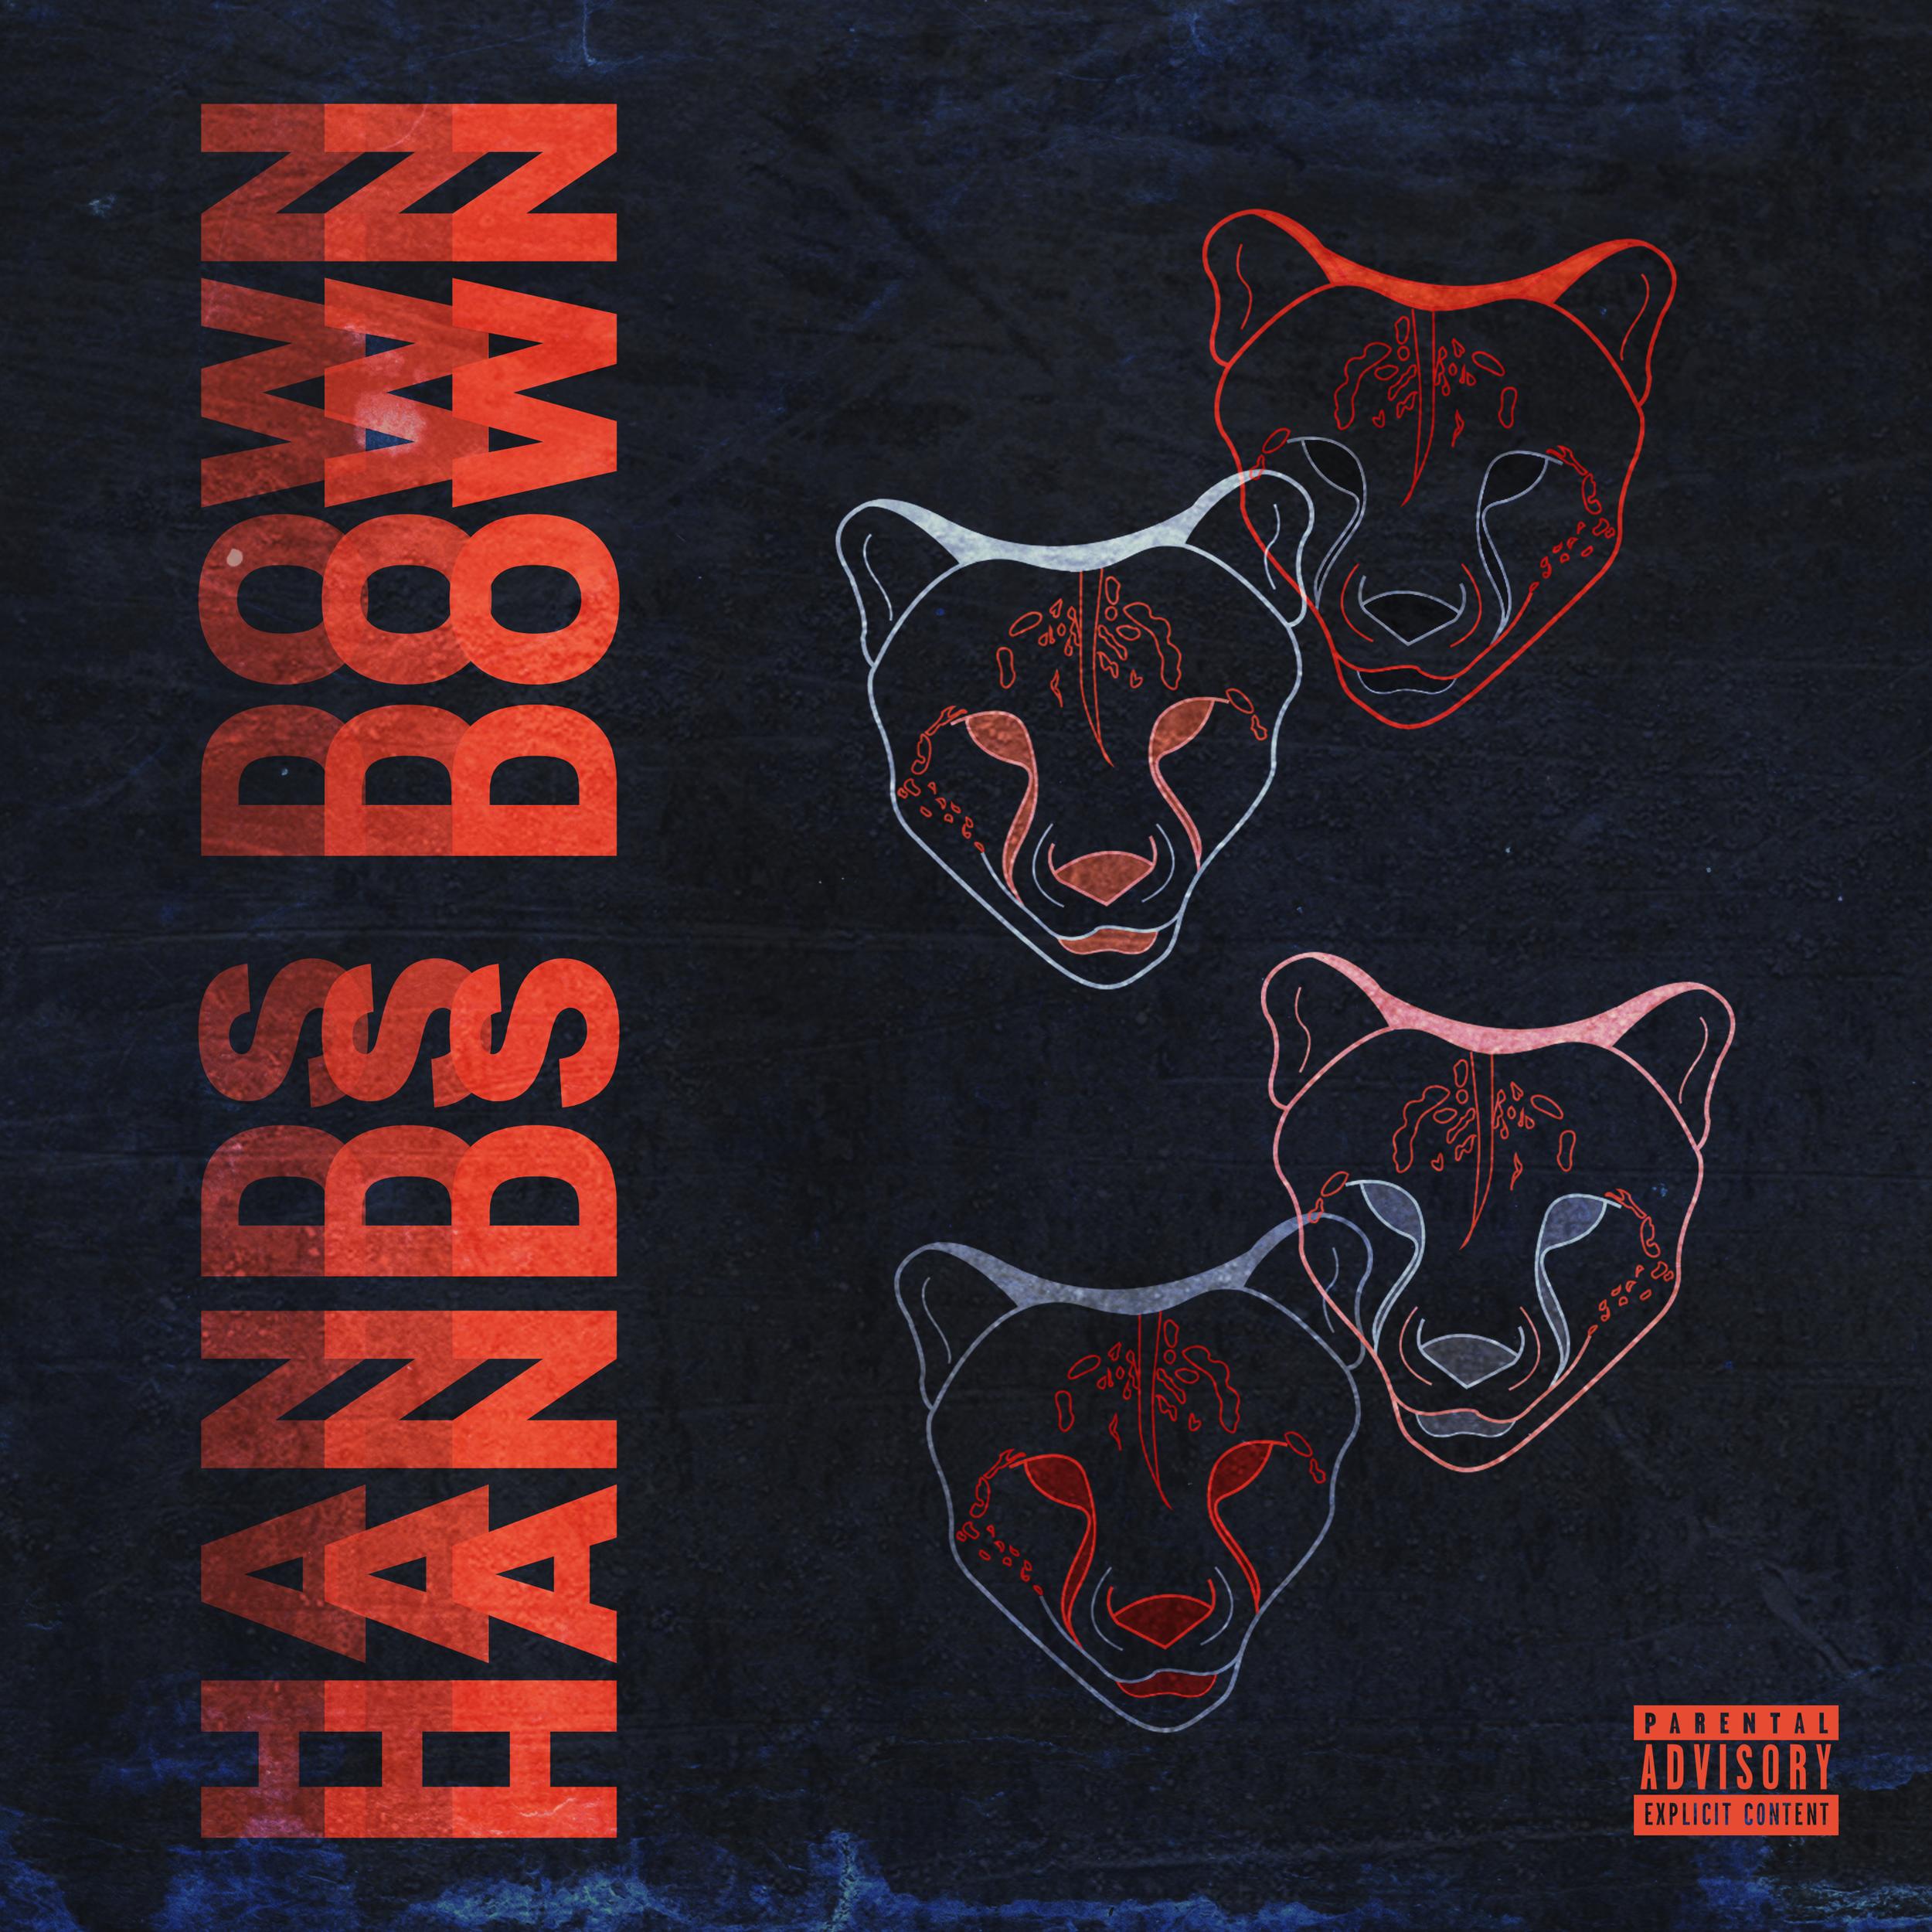 Hands down - Single cover artwork for MeanJoeScheme & Optiks